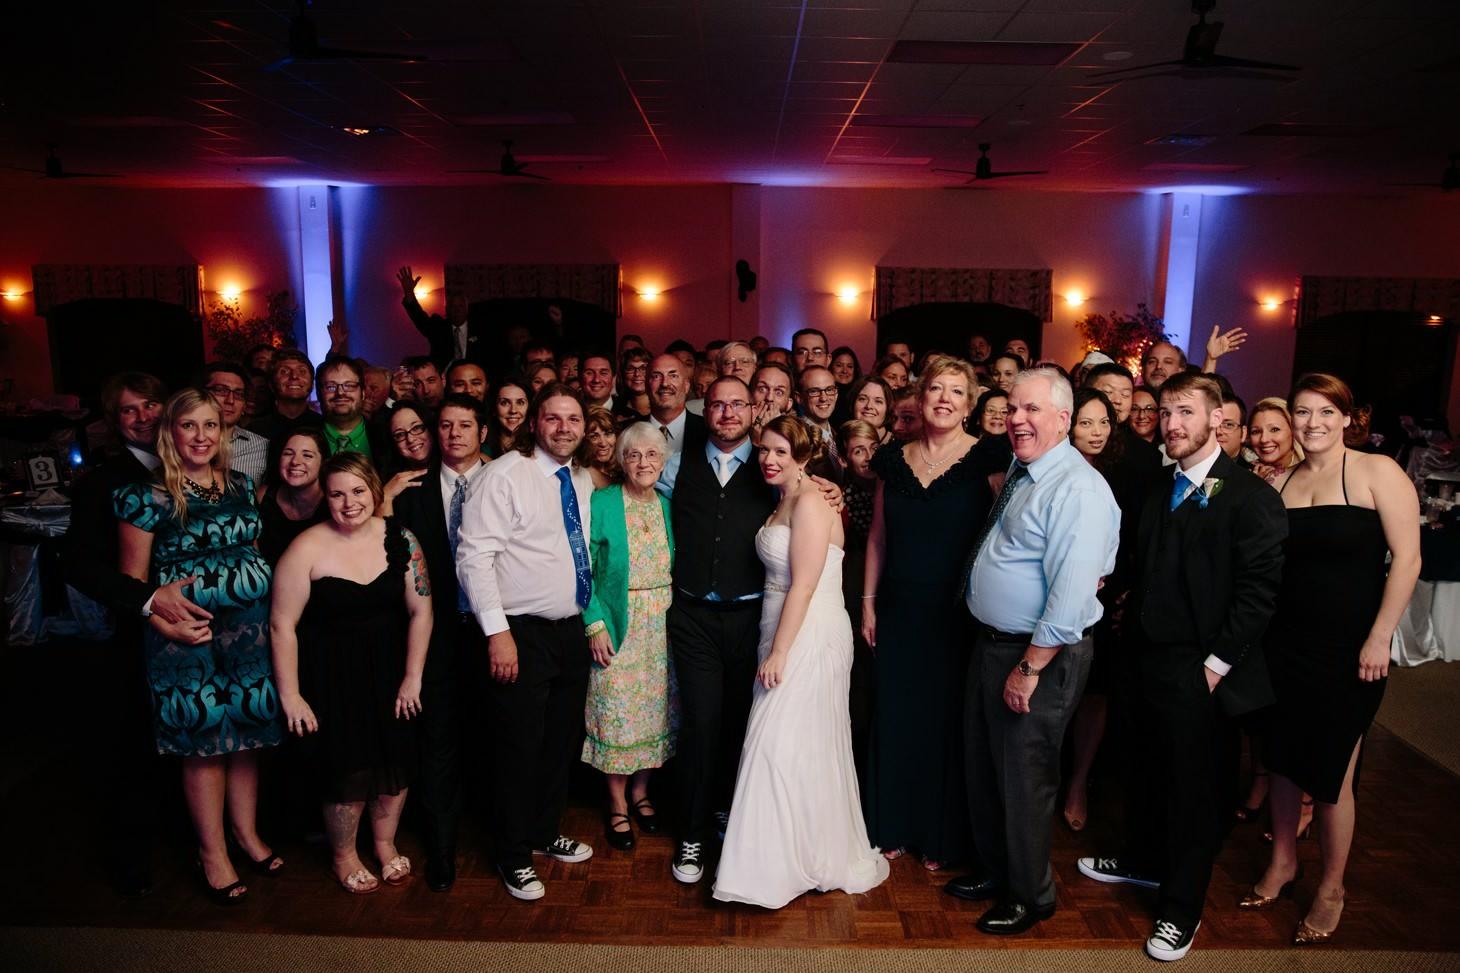 041-nyc-wedding-photographer-nj-nerdy-dr-who-firehouse-wedding-smitten-chickens.jpg